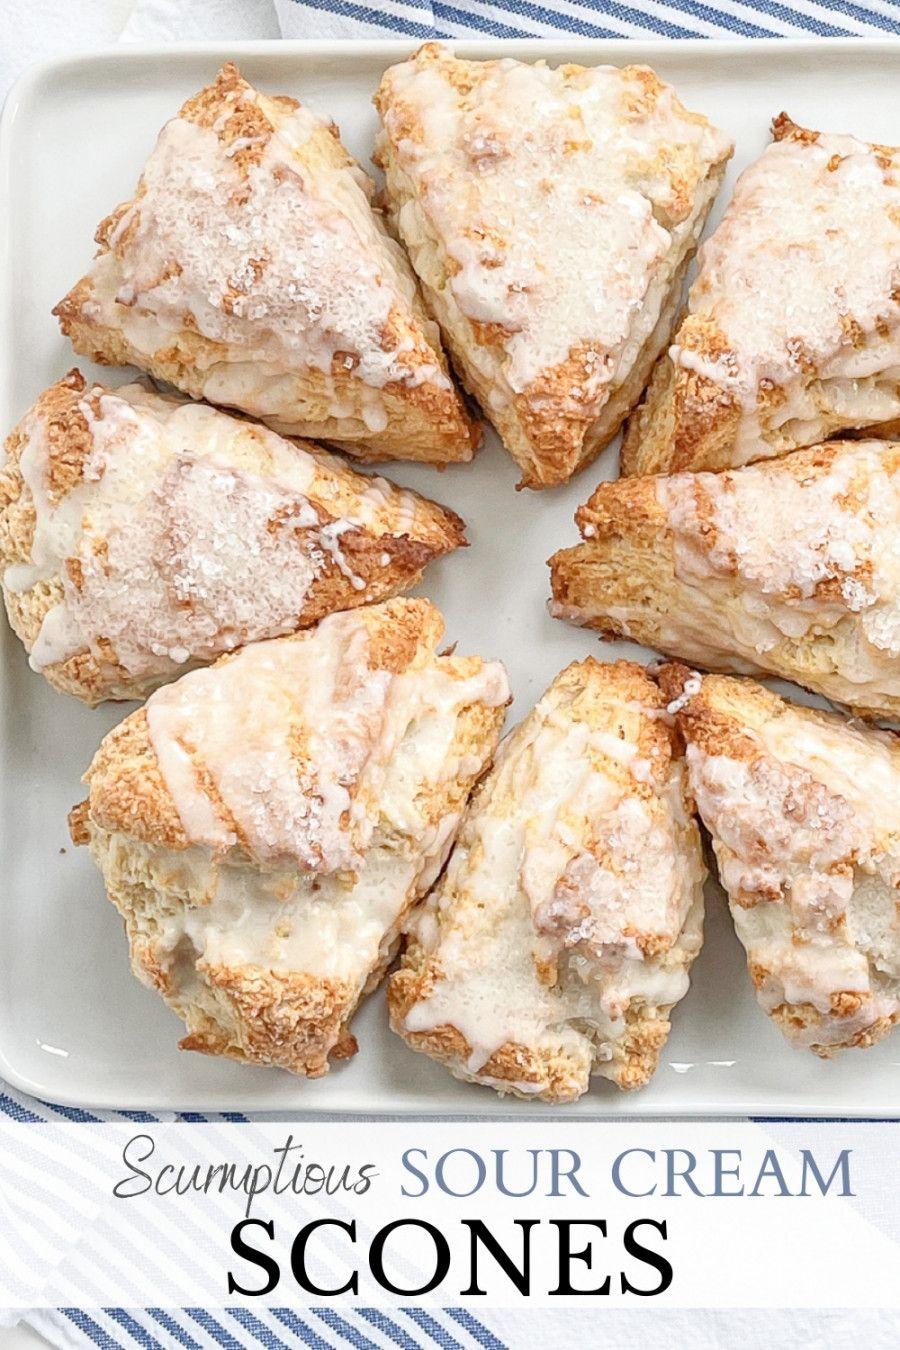 The Amazing Sour Cream Scone Stonegable Recipe In 2021 Sour Cream Scones Cream Scones Recipes